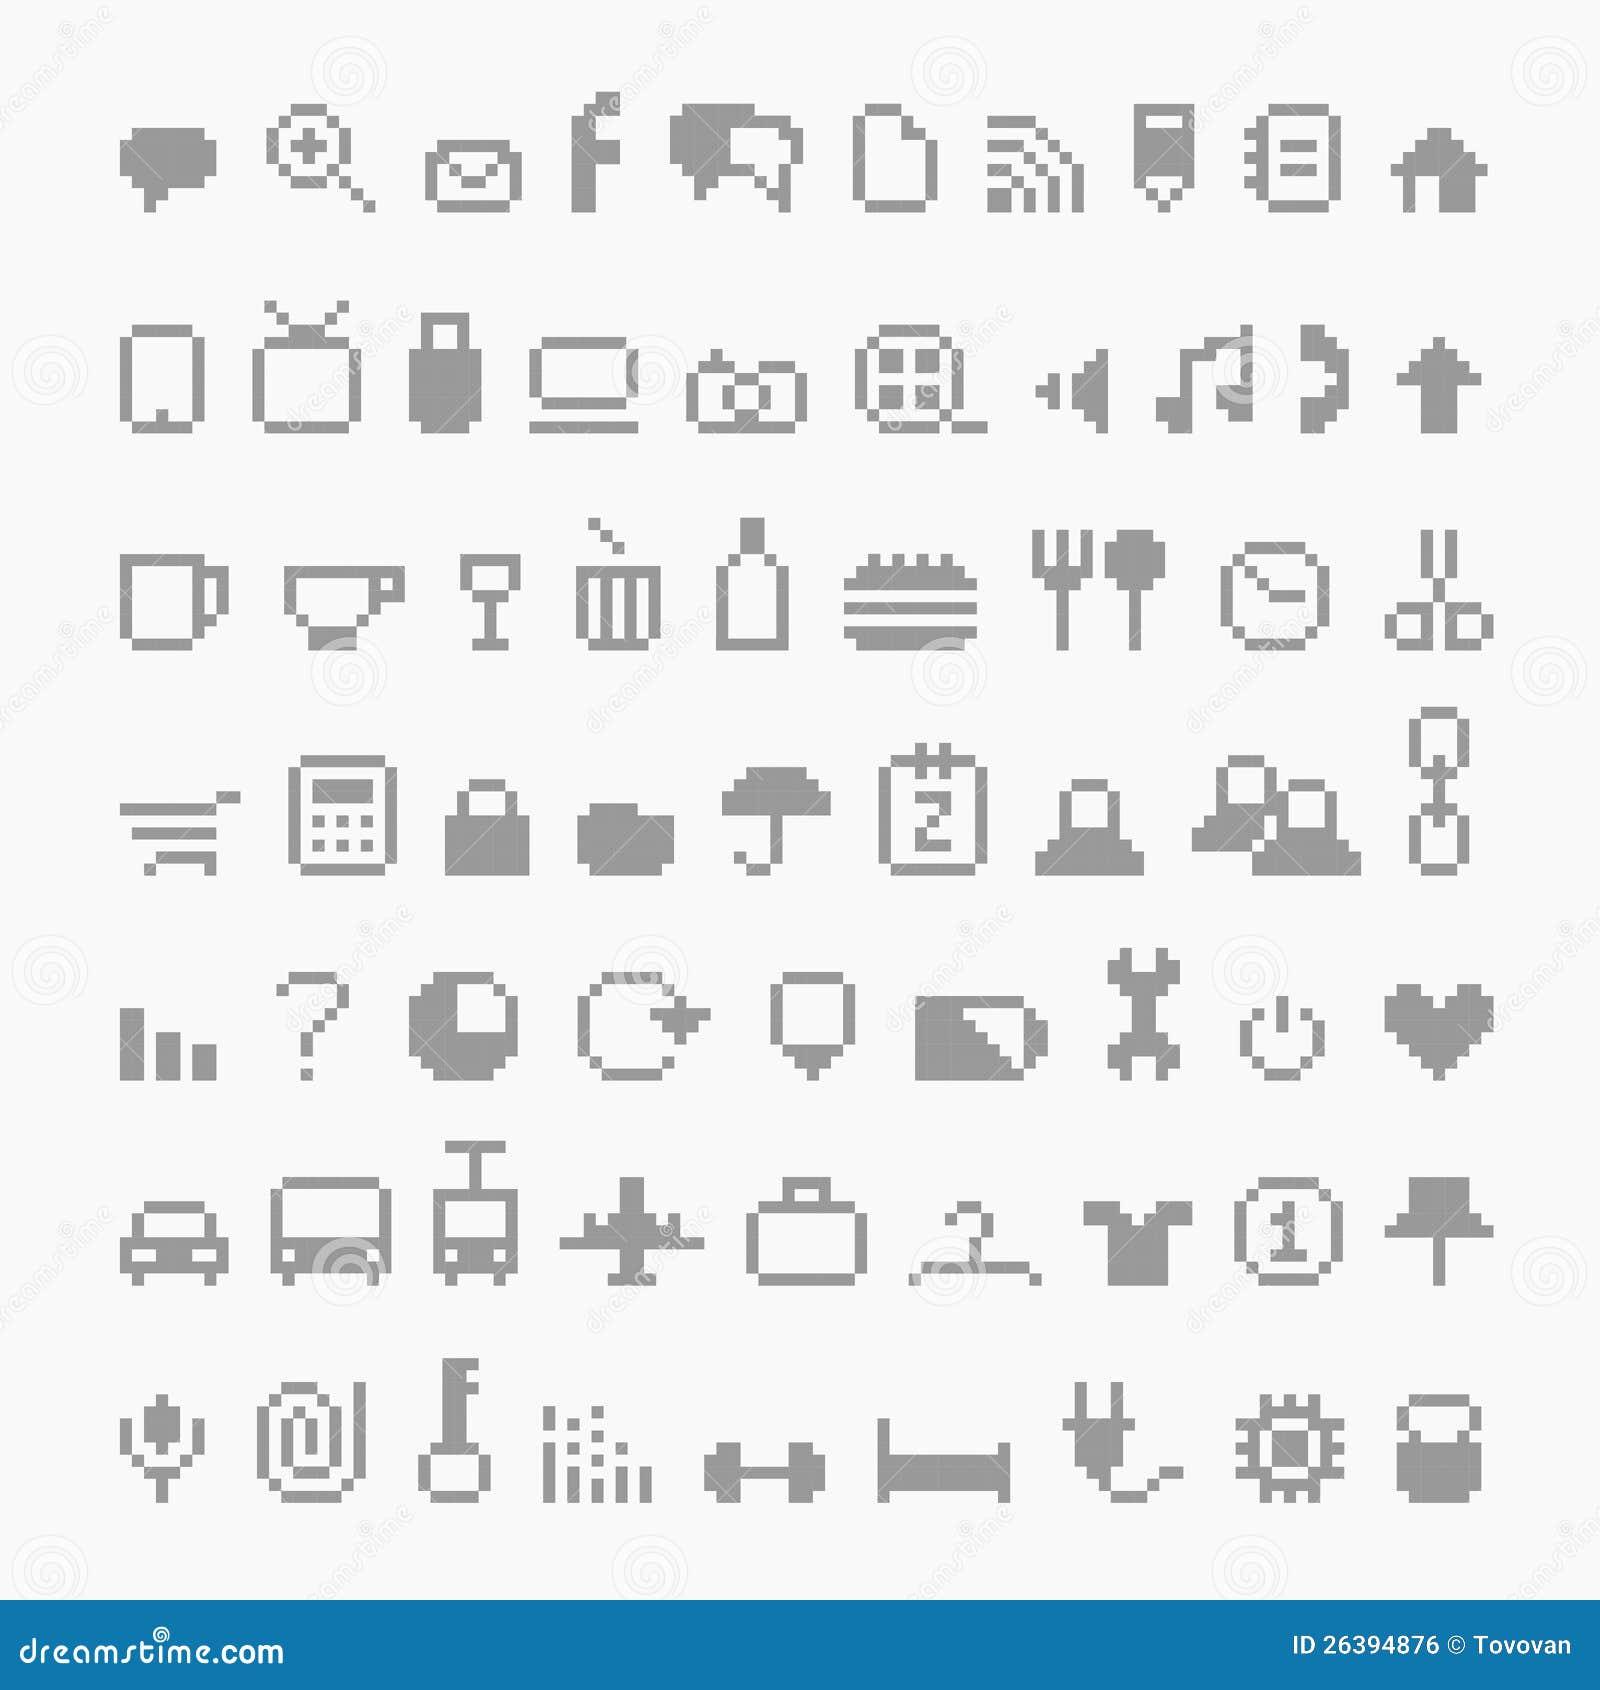 pixel icons royalty free stock image image 26394876